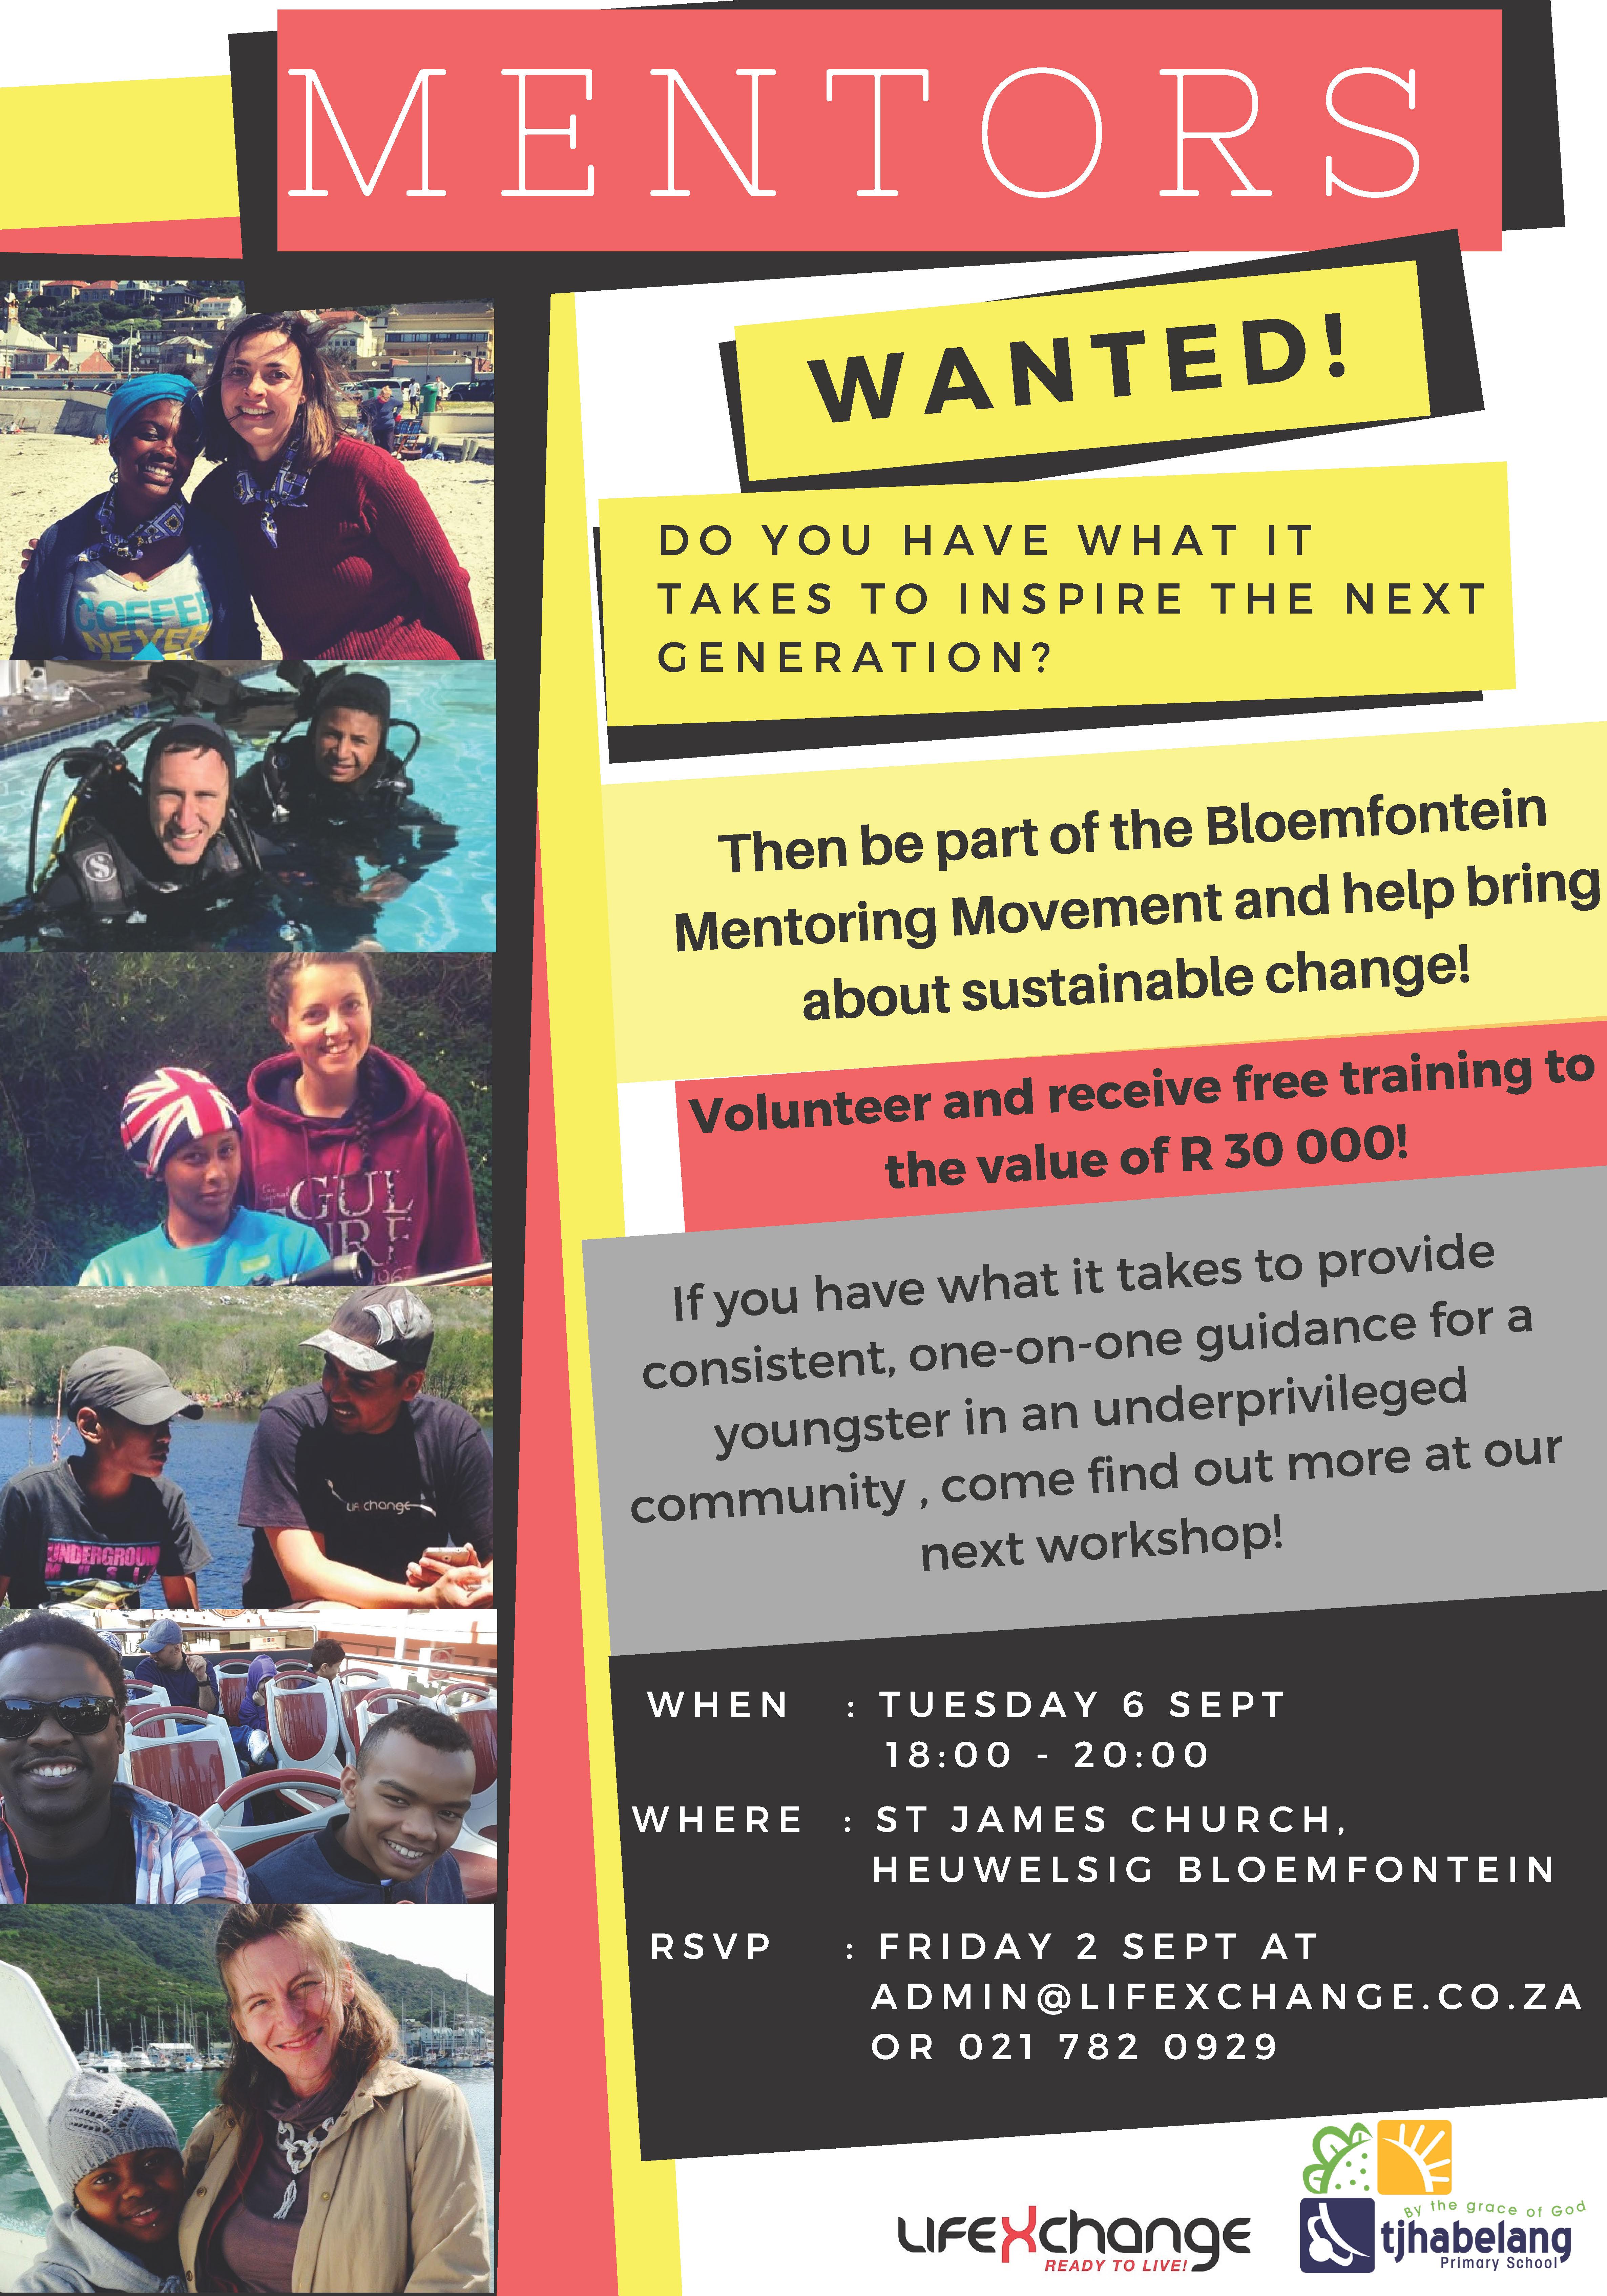 Tjhabelang mentor recruitment poster eng